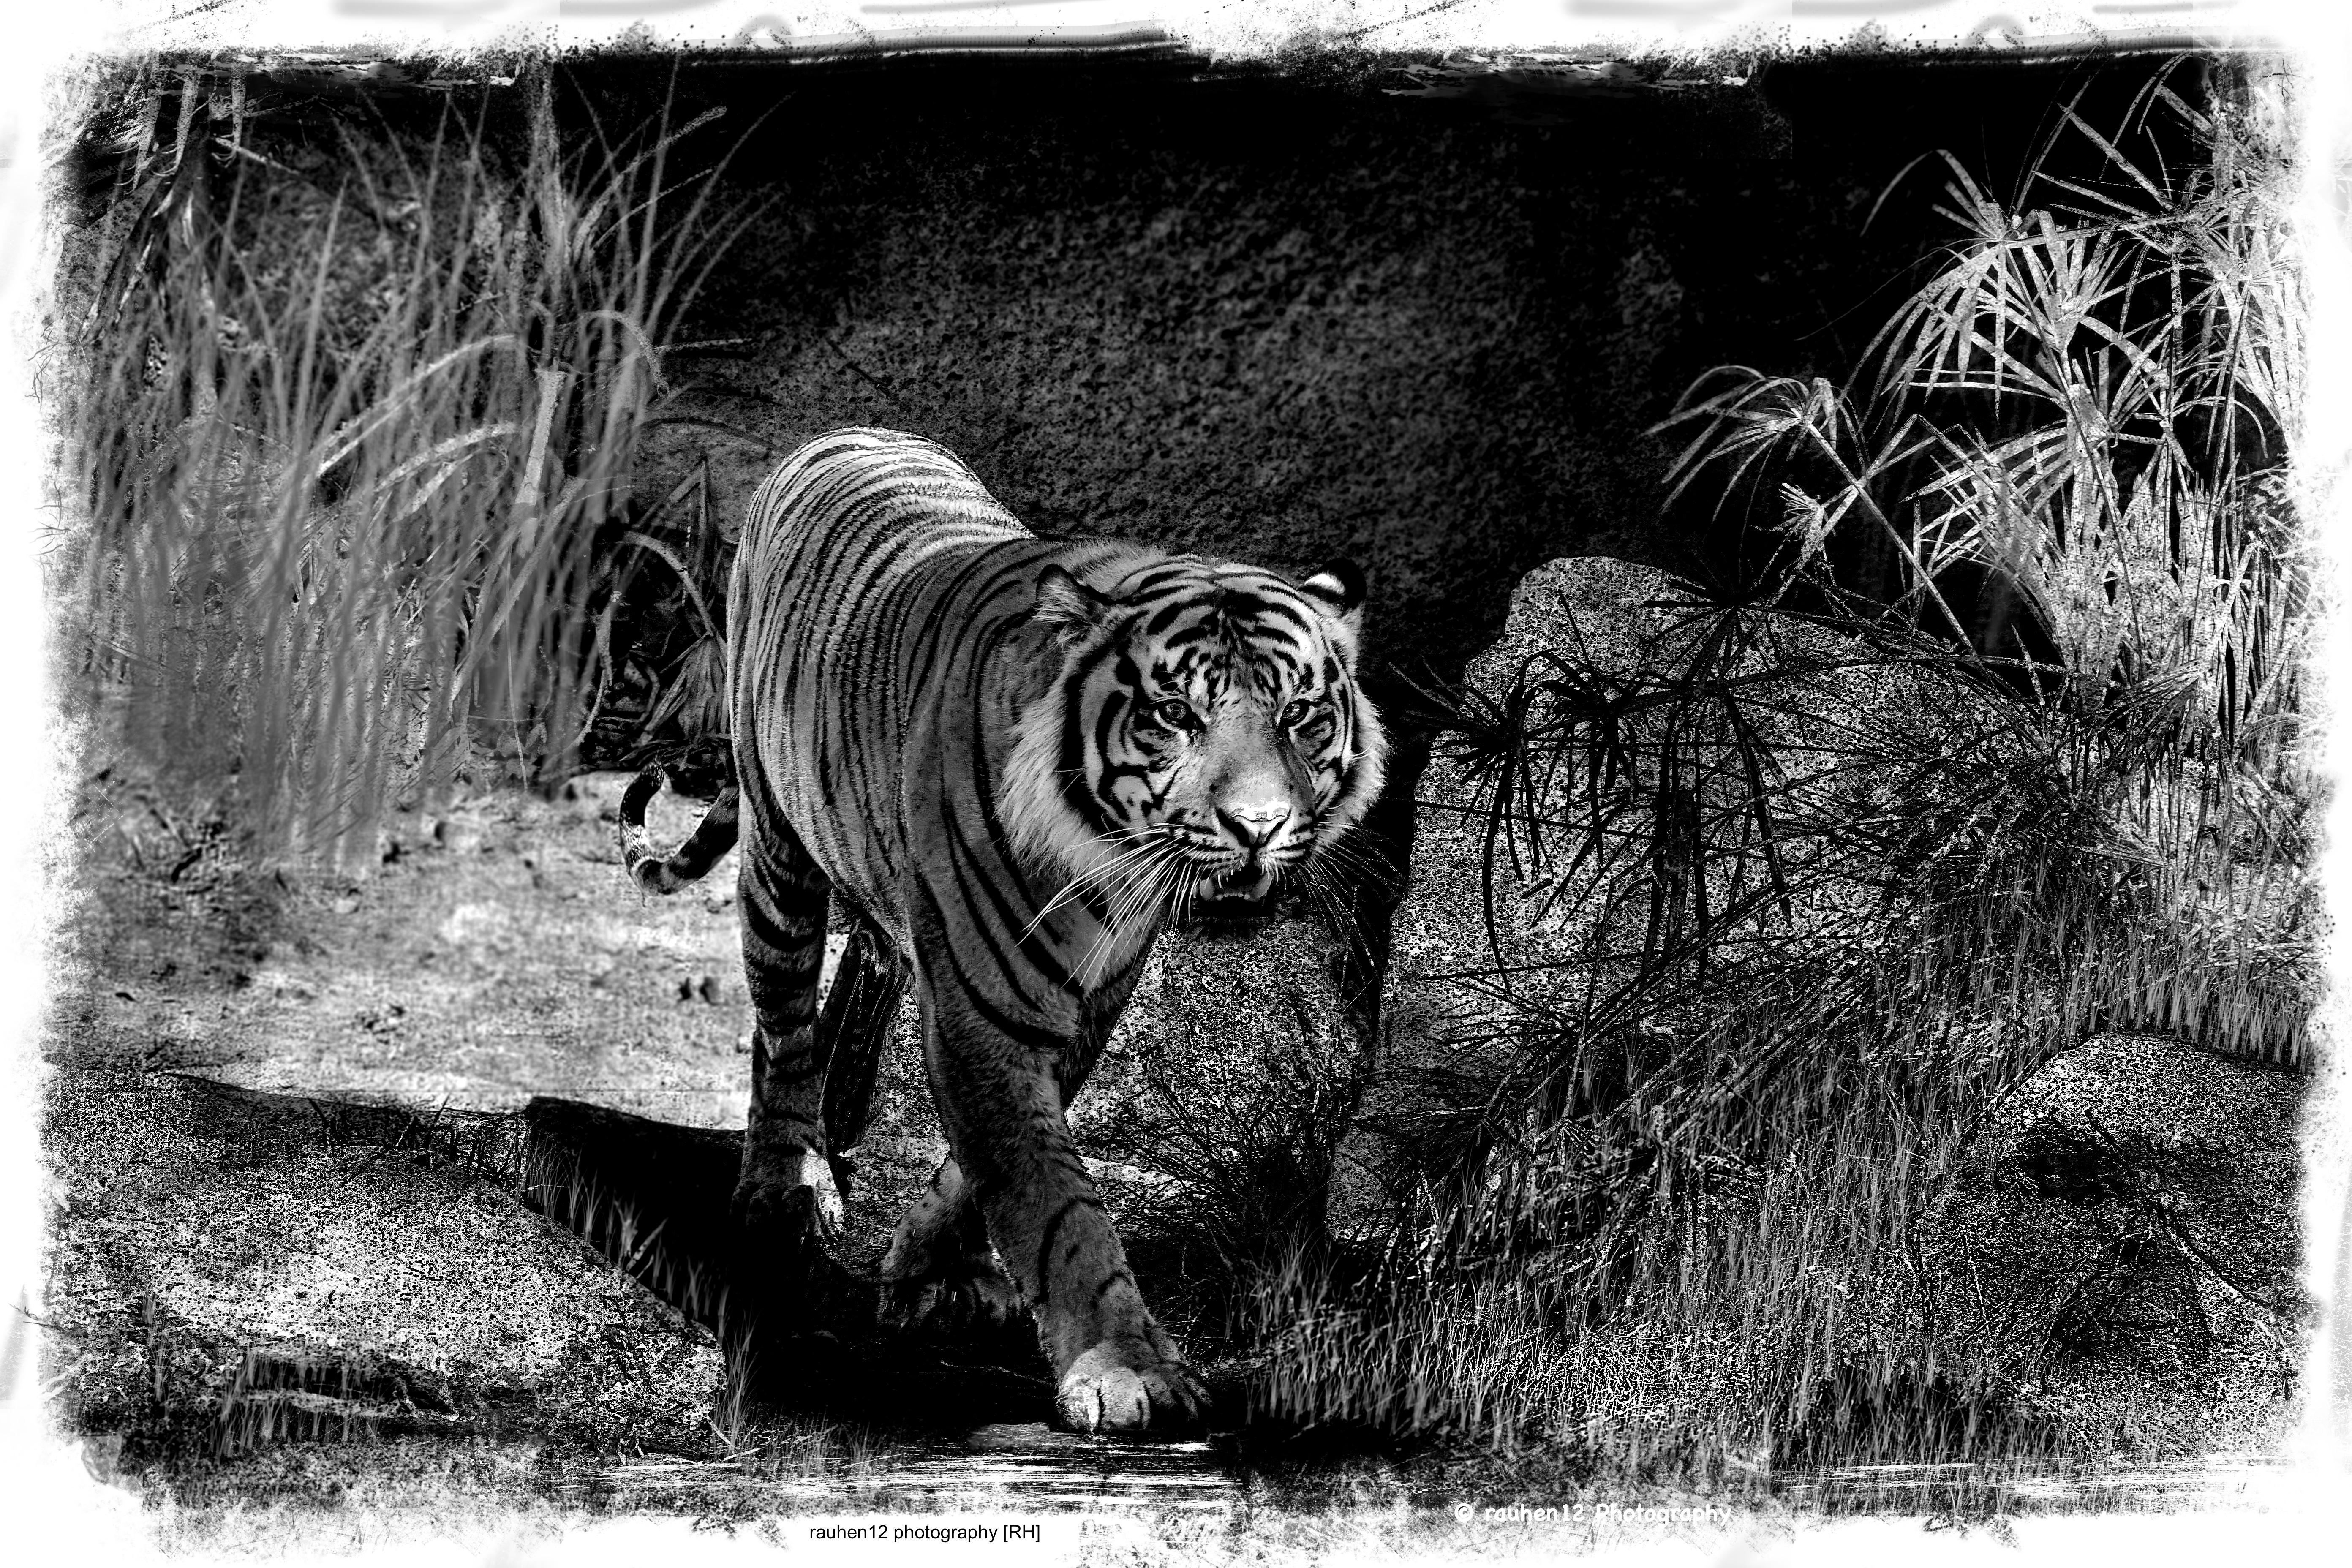 tiger1.3,43 copia 2